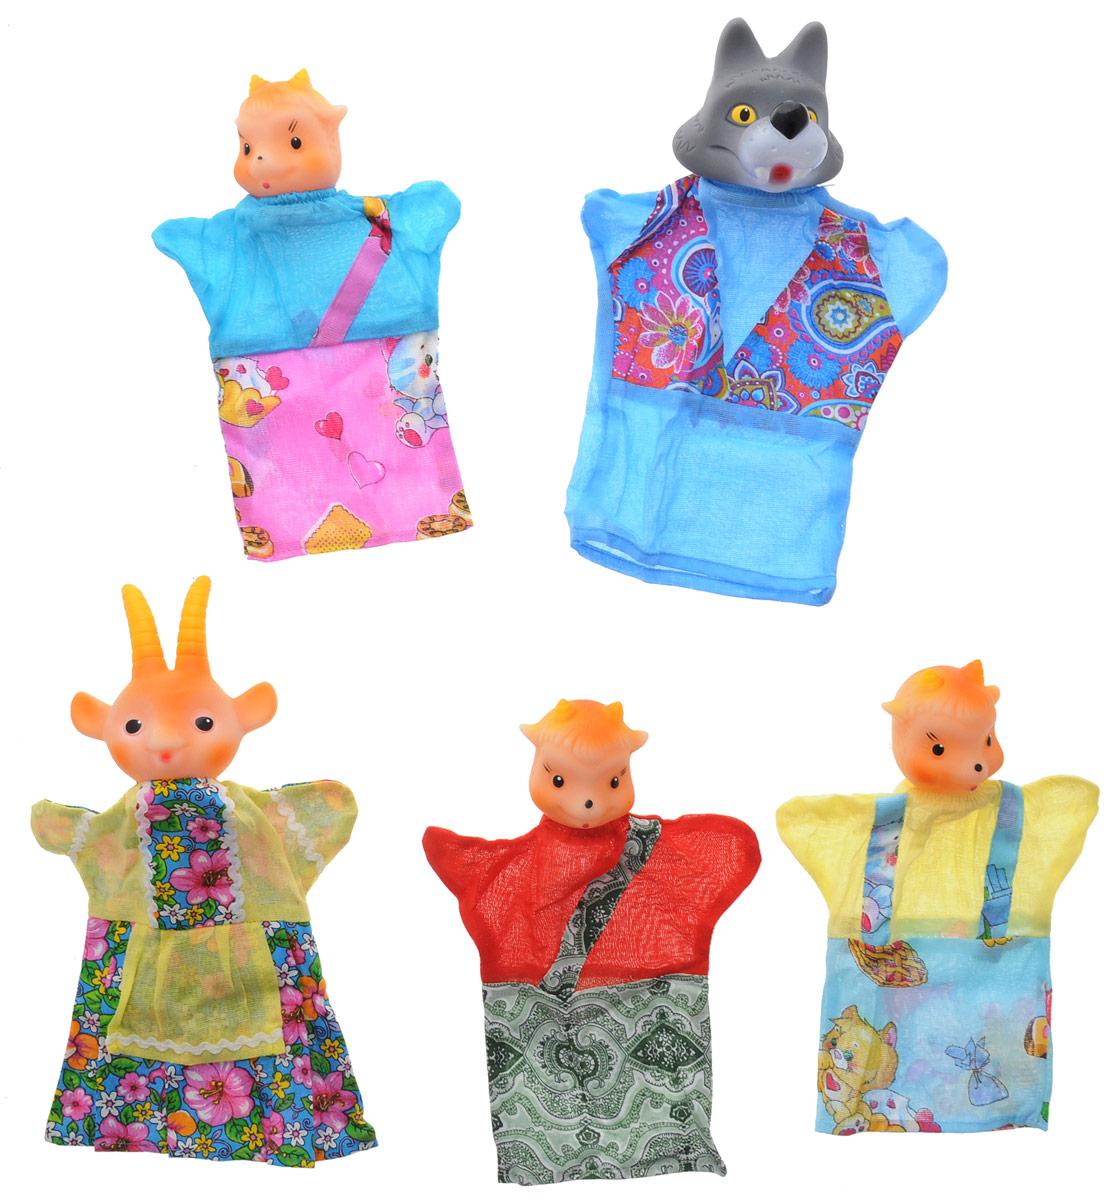 картинки куклы на руку для театра узкопалый широкопалый